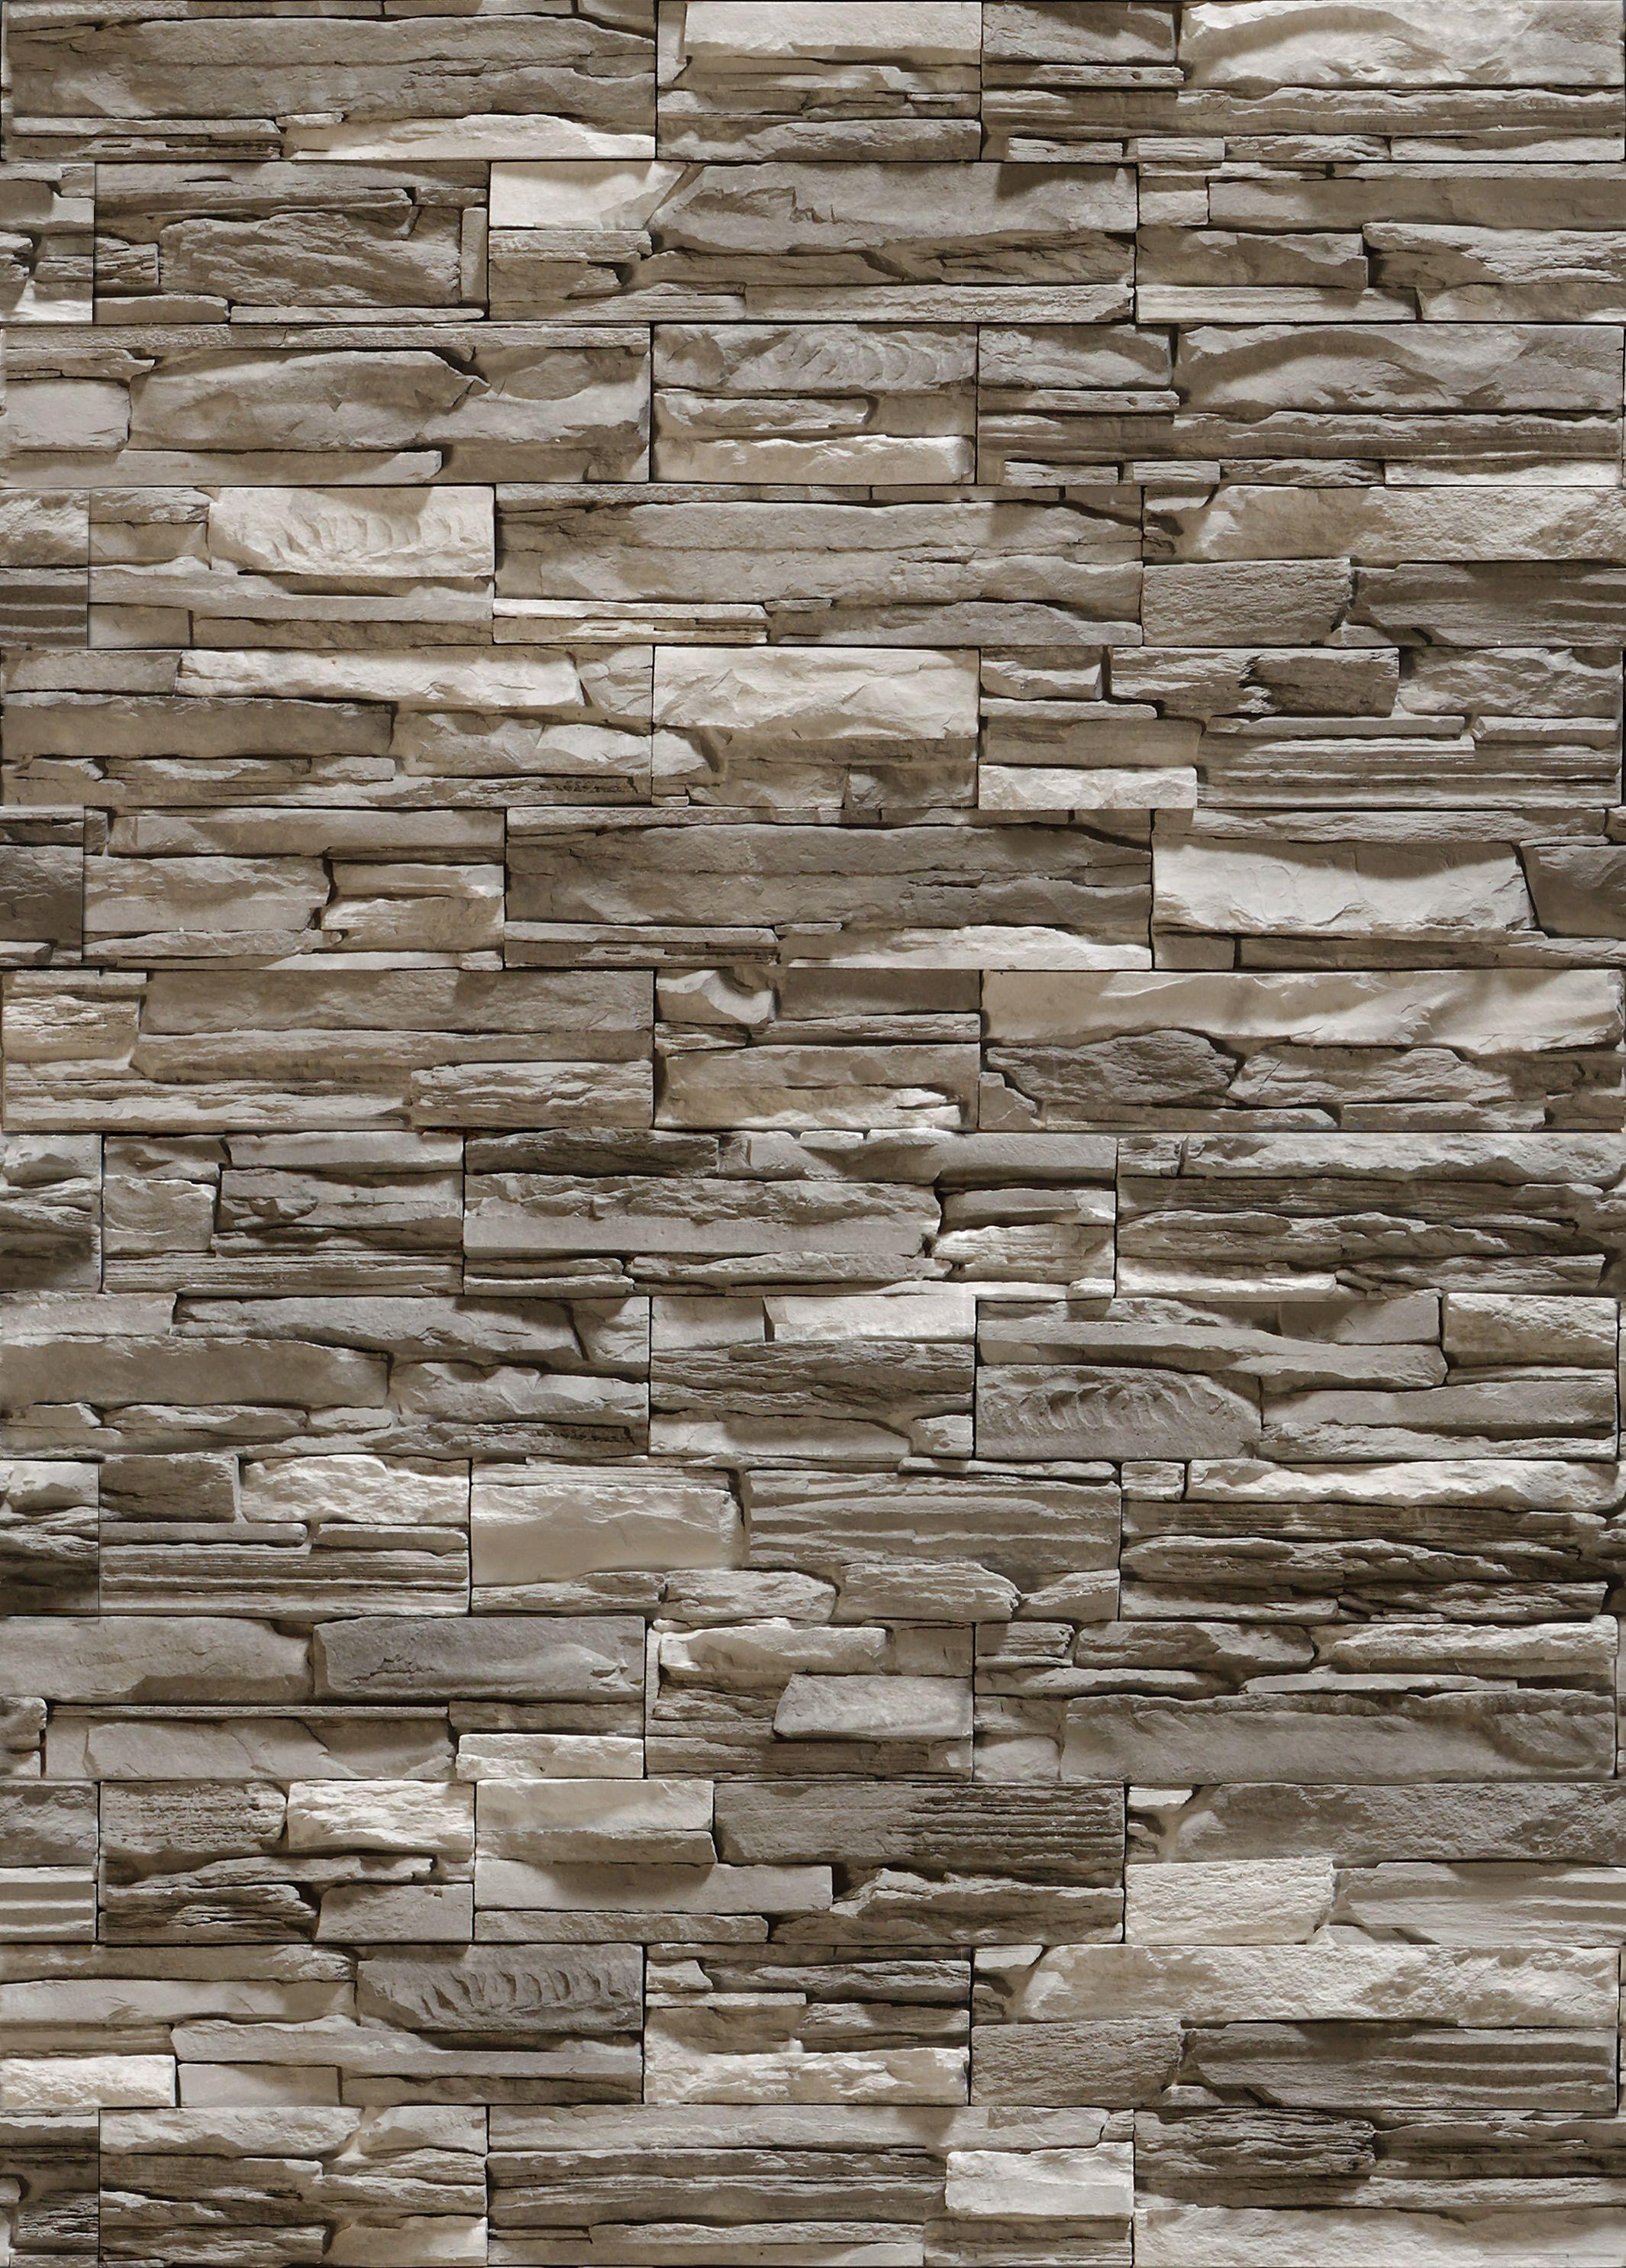 piedras texturas wall